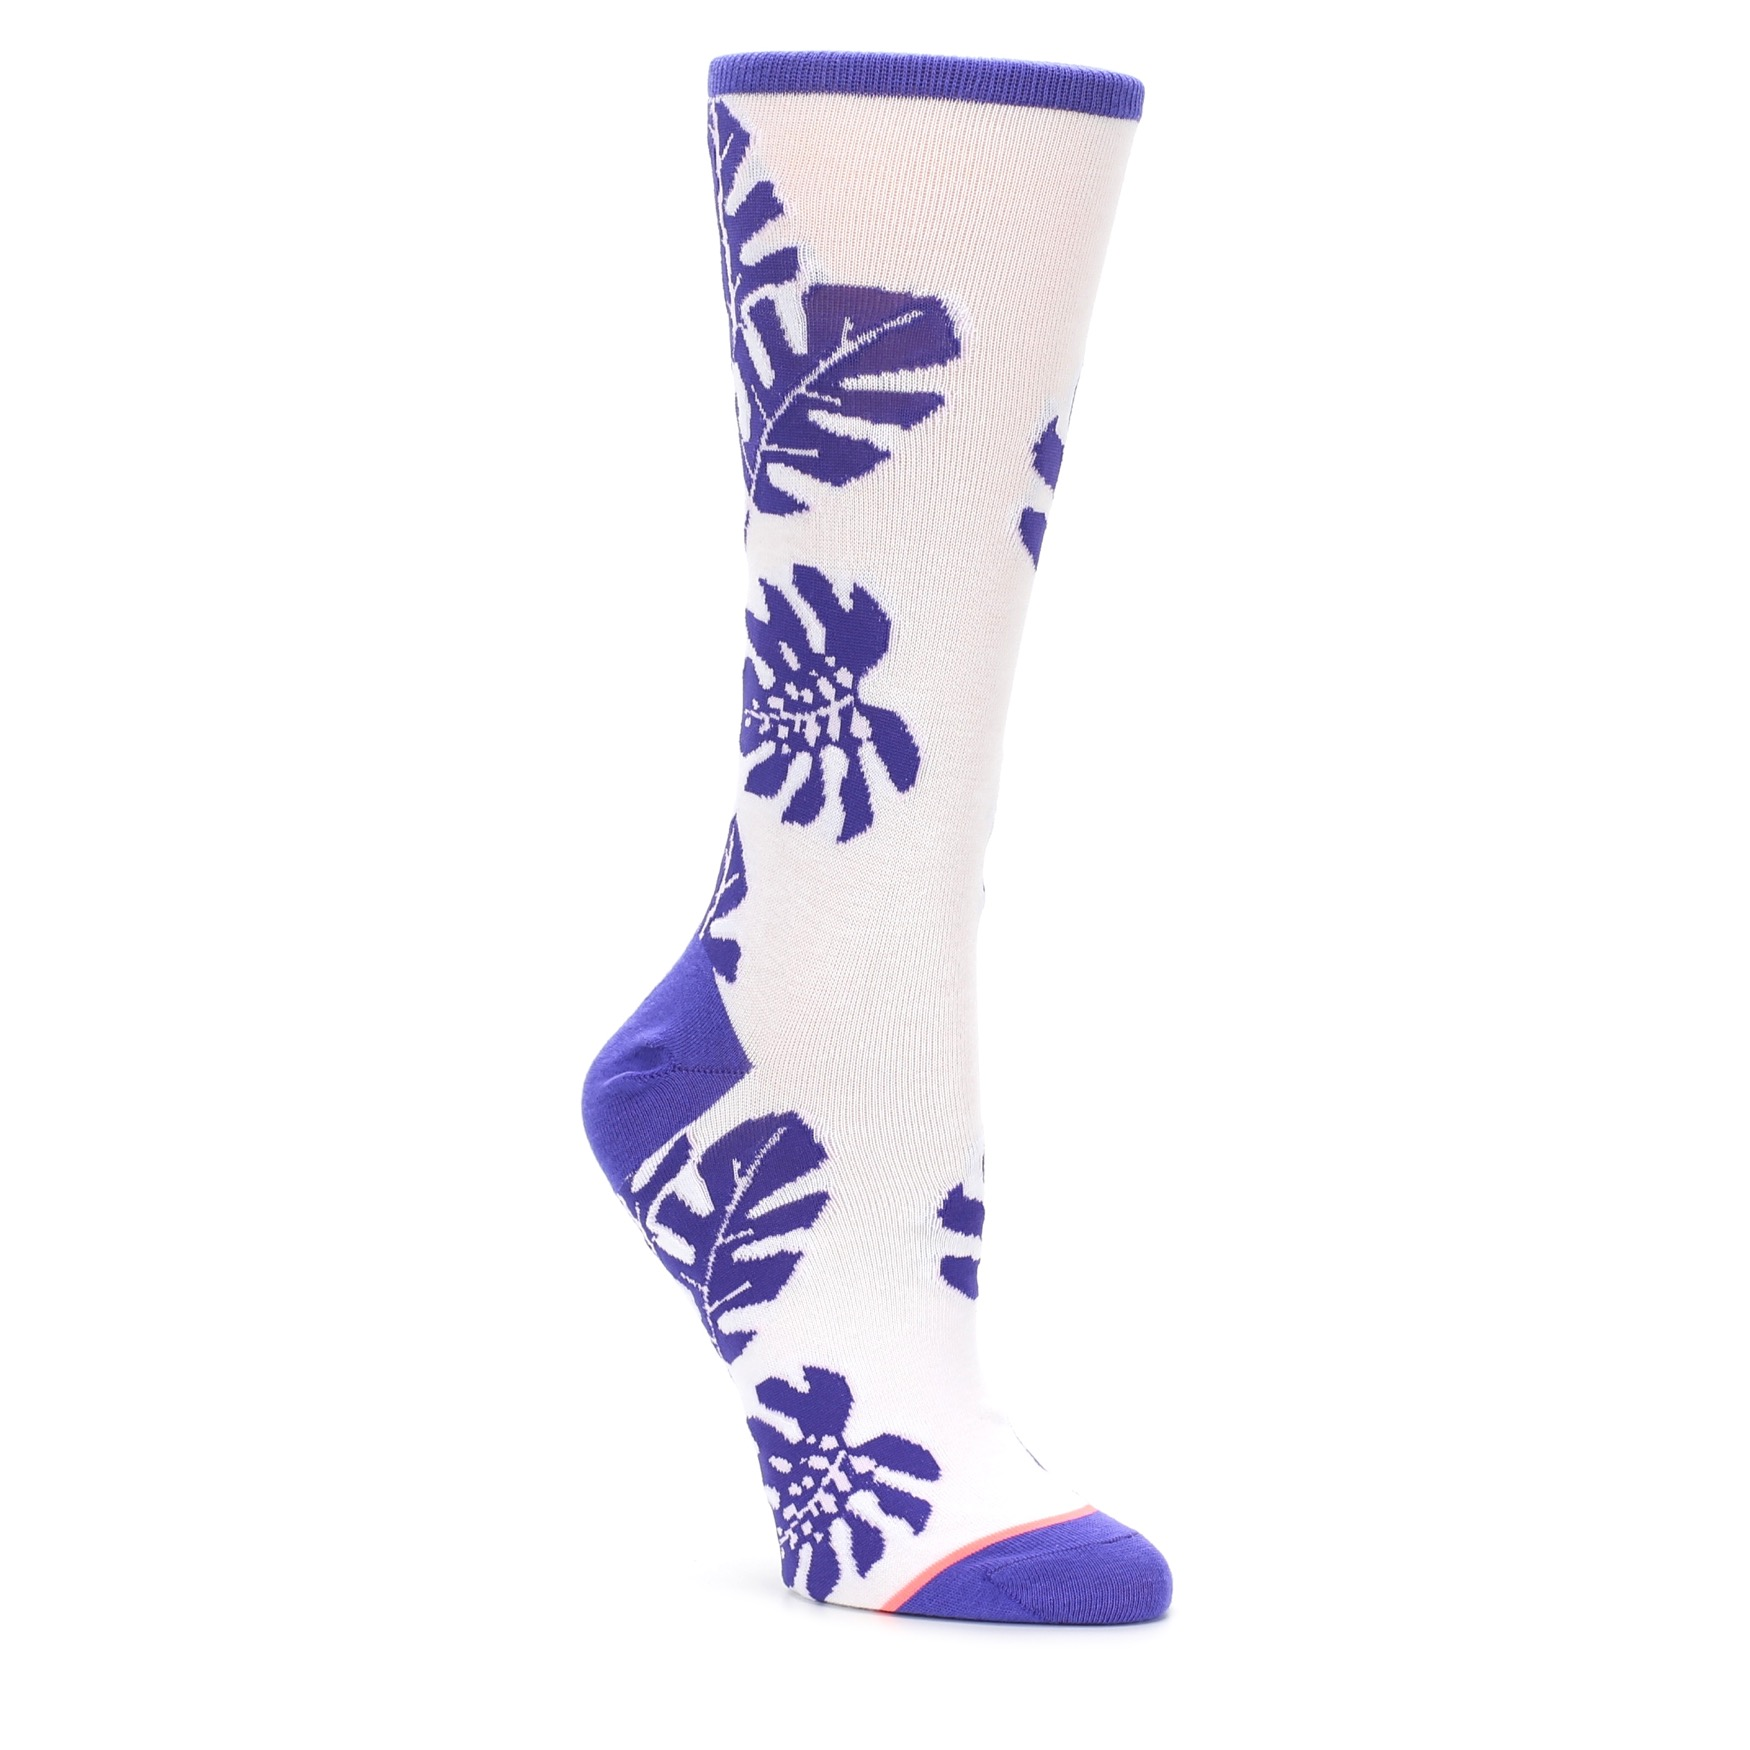 Purple White Leaves Socks - Women's Casual Socks | boldSOCKS